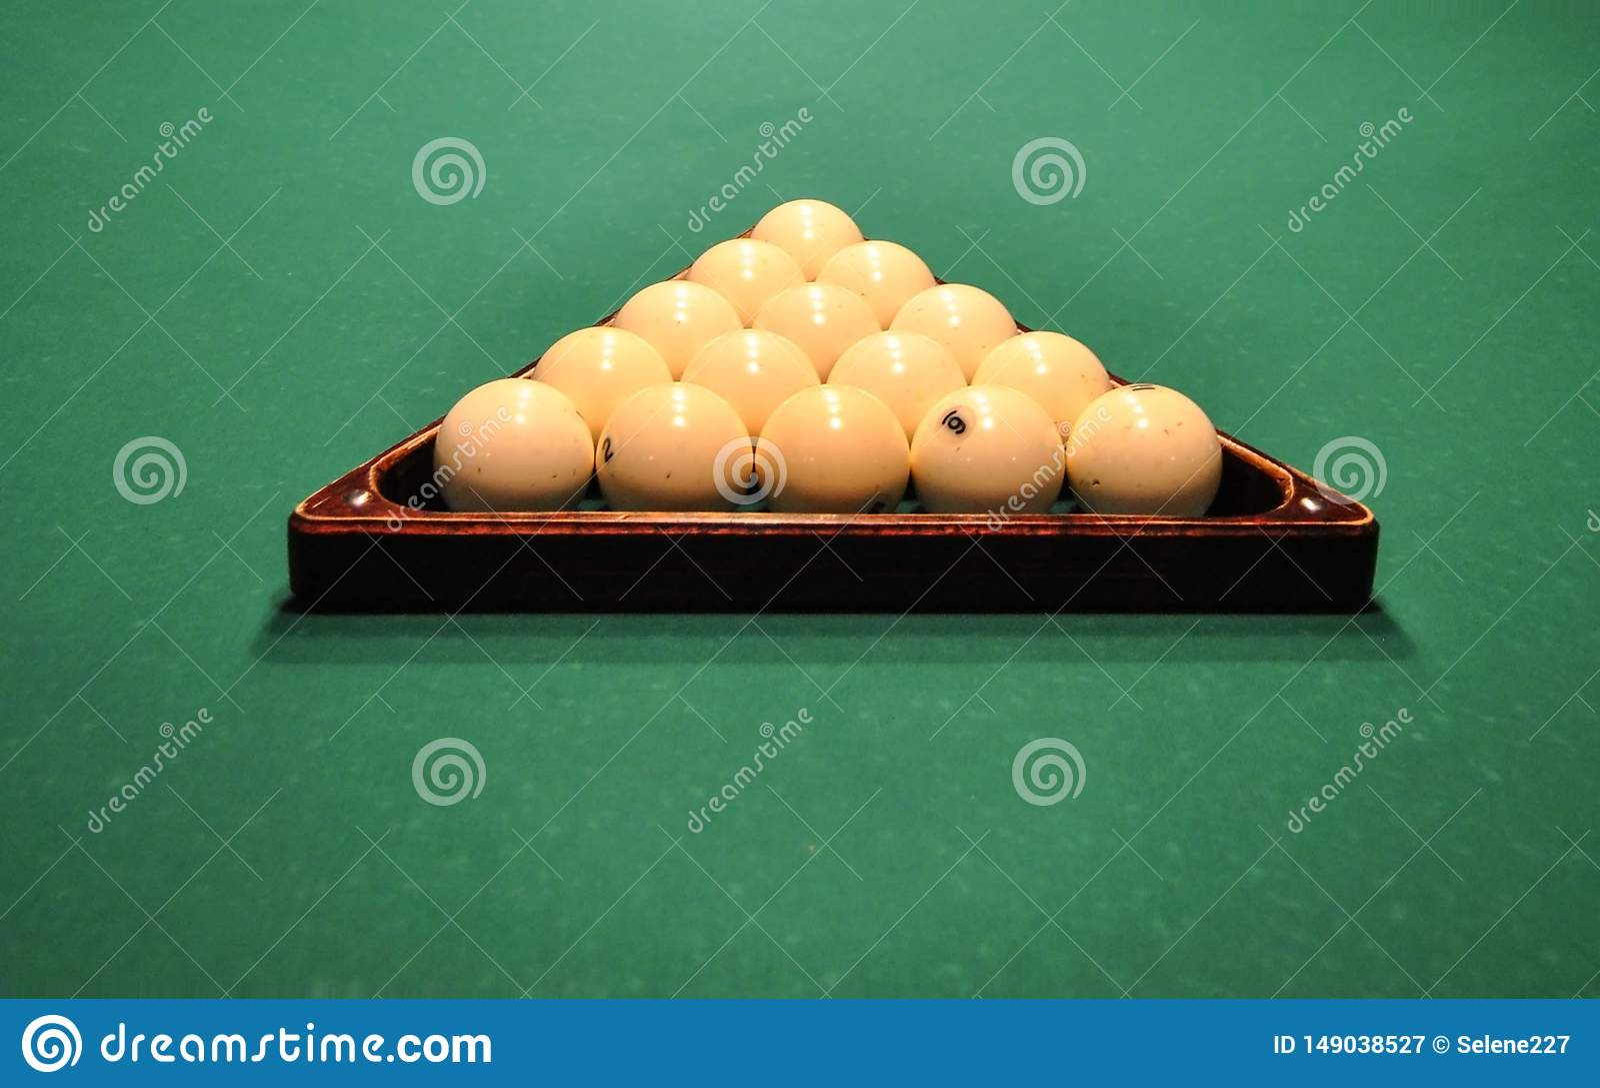 Billiard balls in wooden triangle